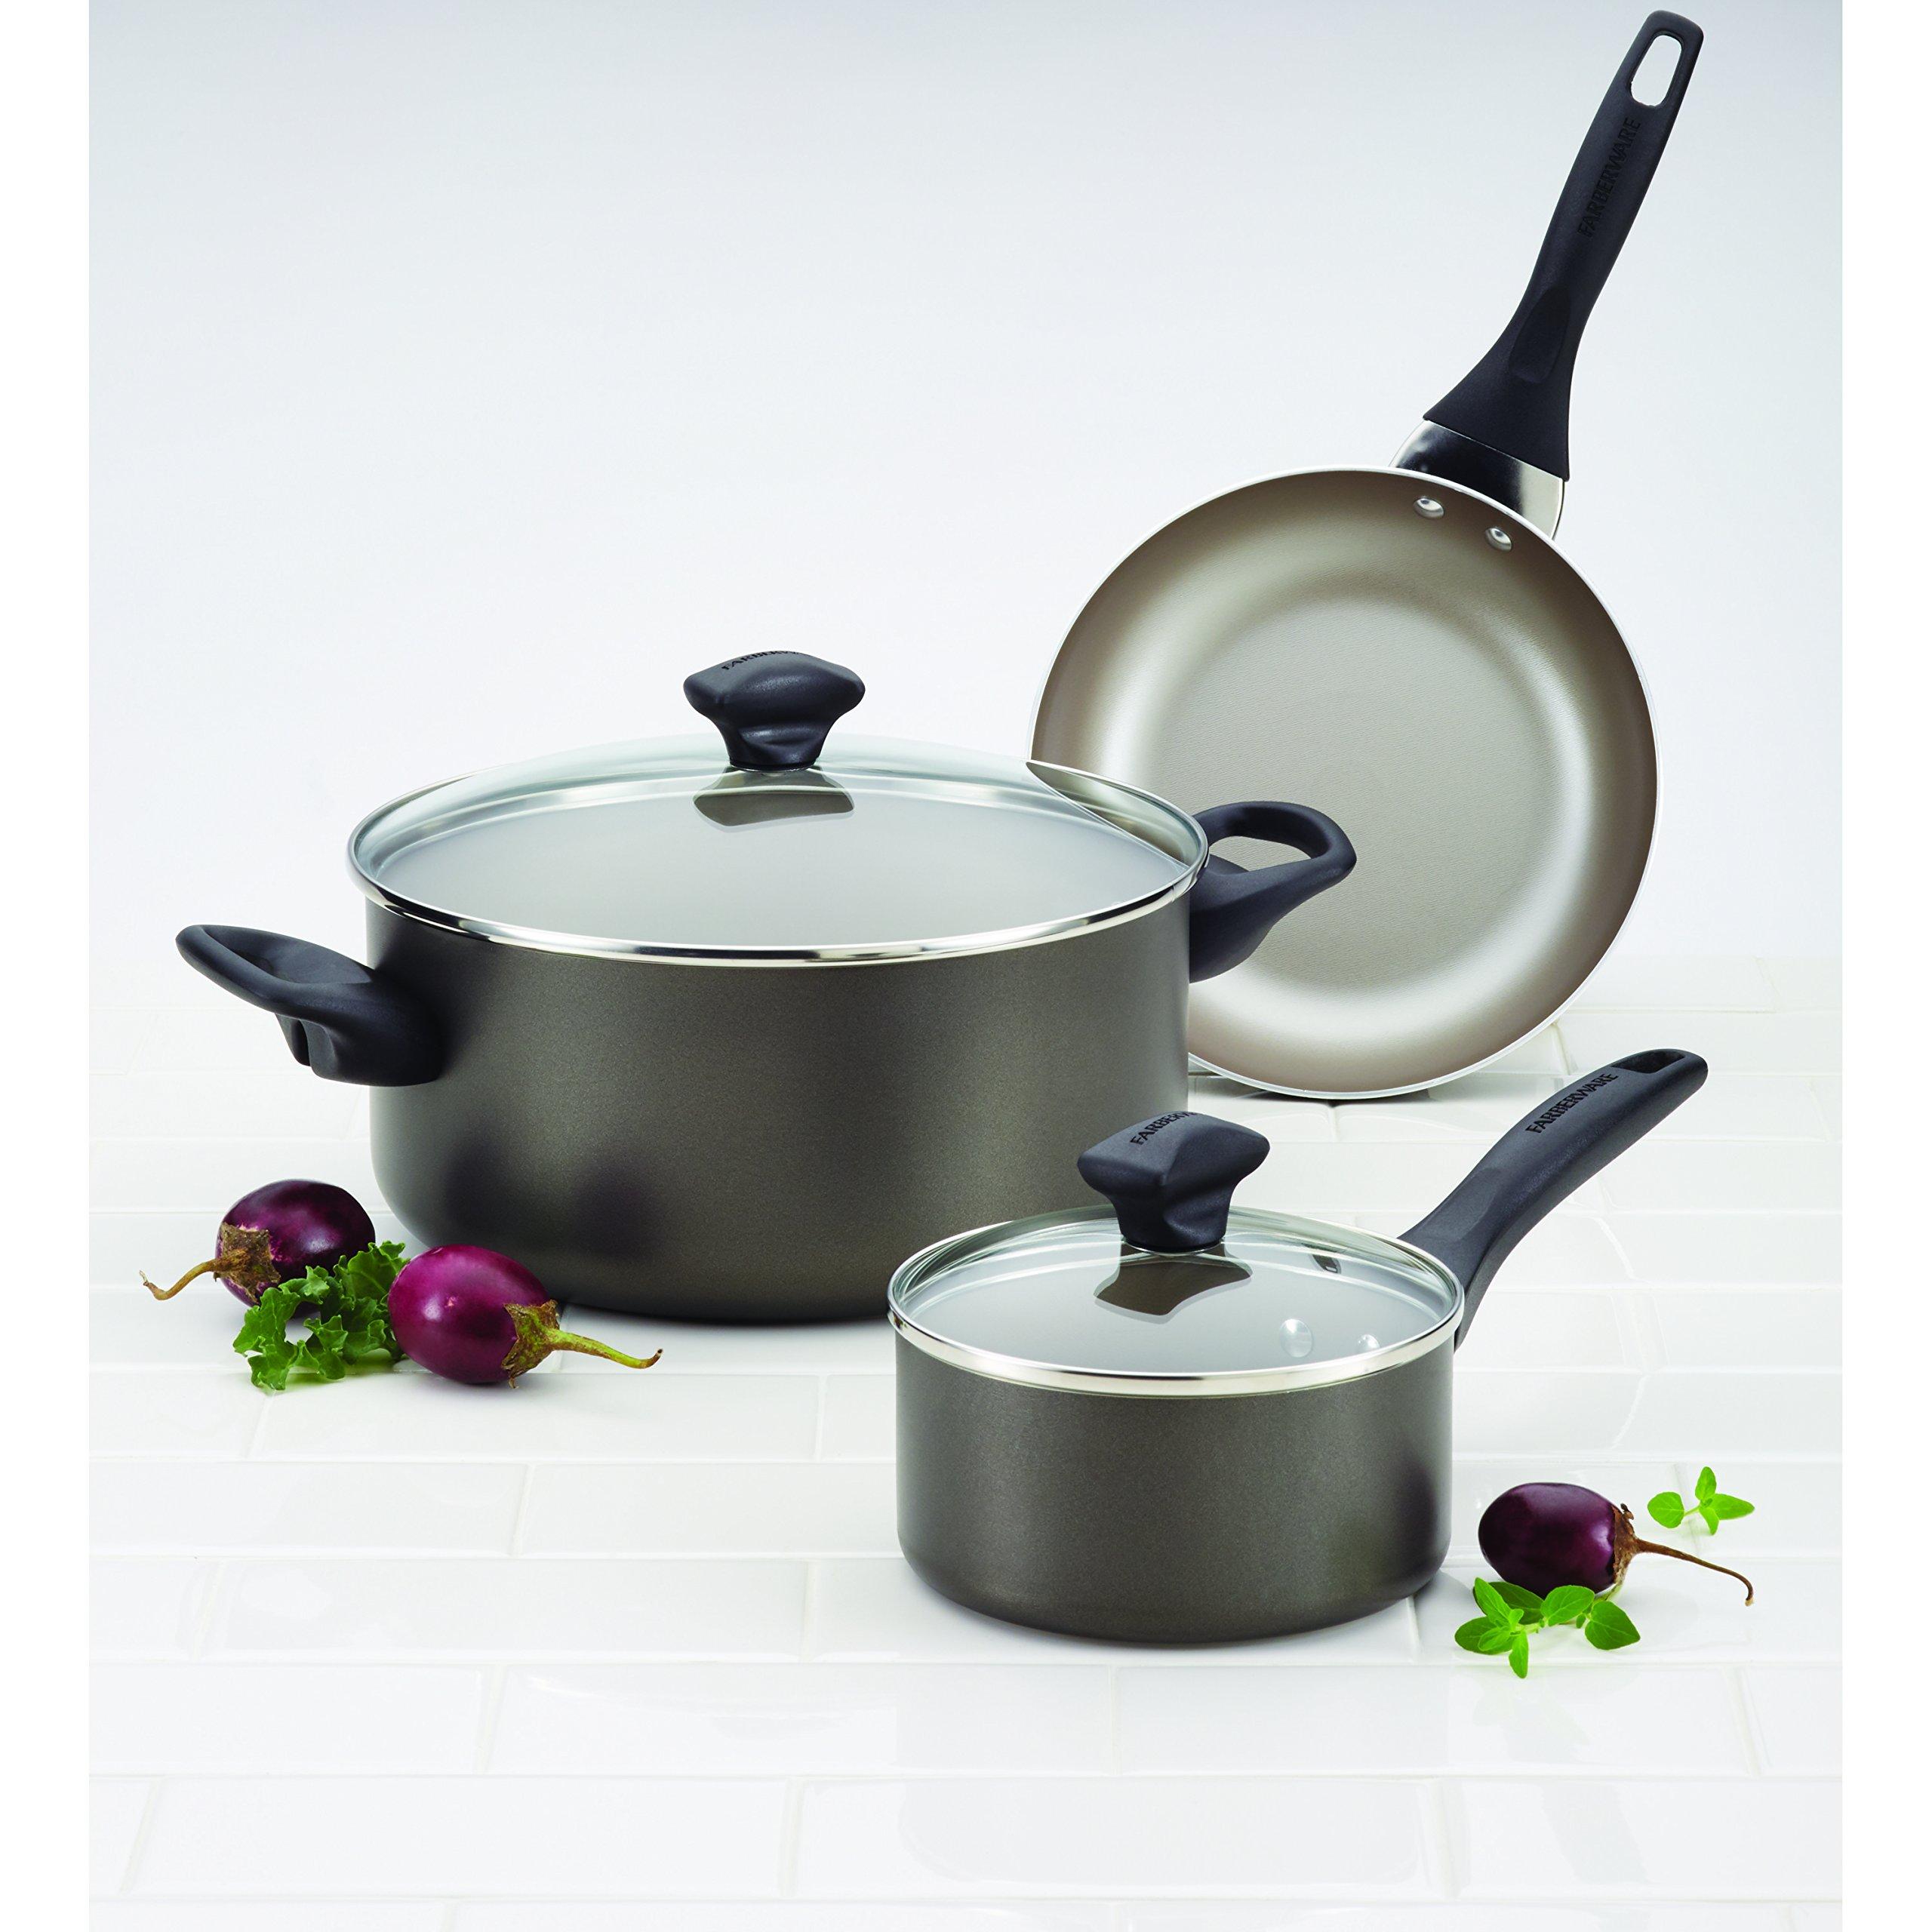 Farberware Dishwasher Safe Nonstick Aluminum 15-Piece Cookware Set, Pewter